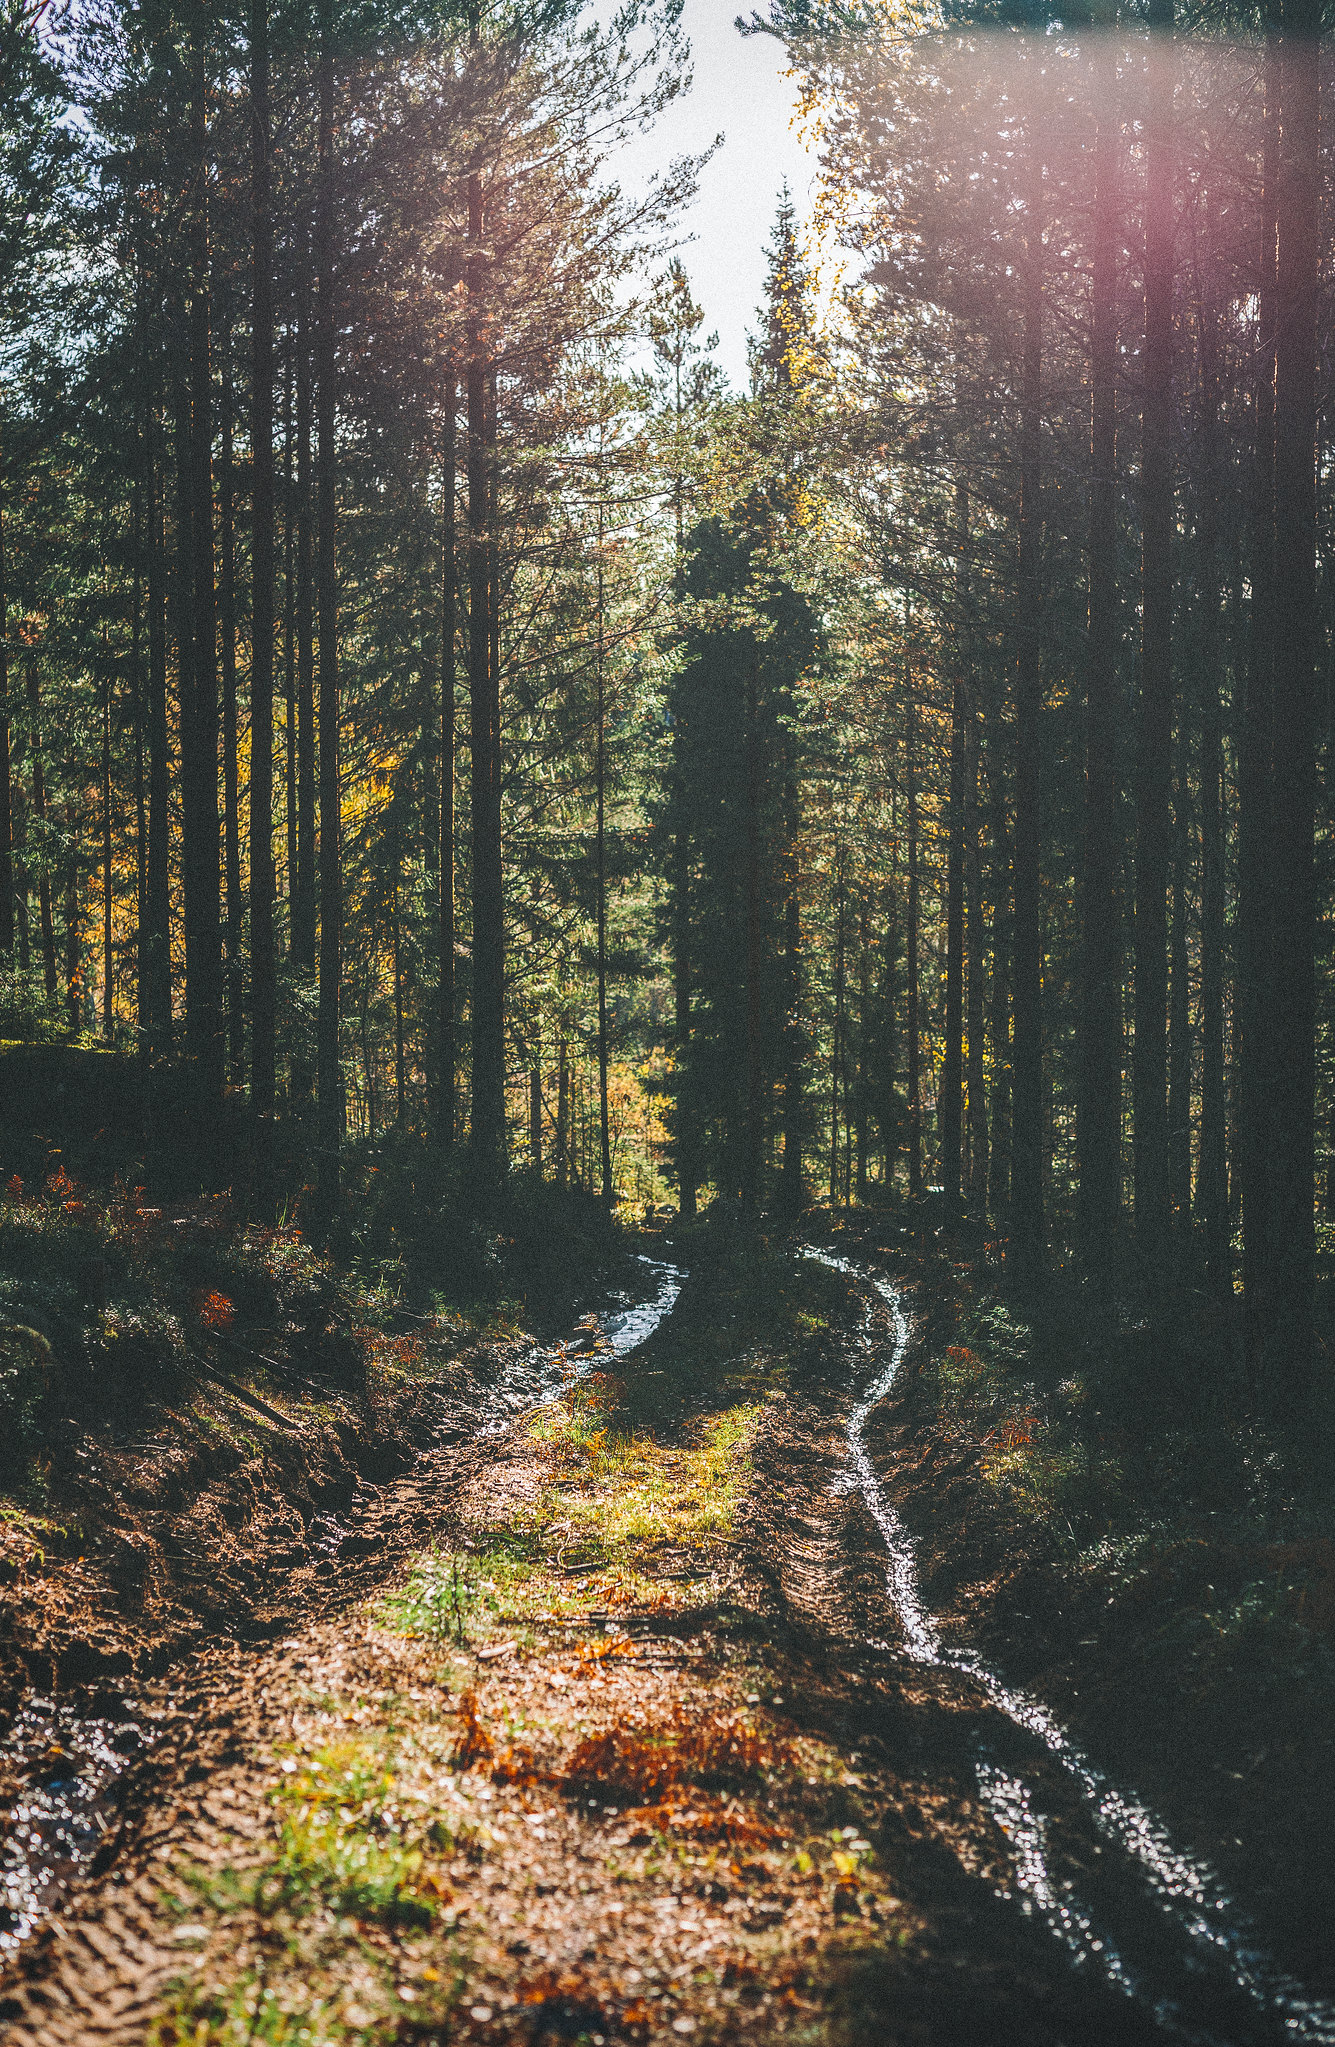 skogspromenad - karinevelina.se